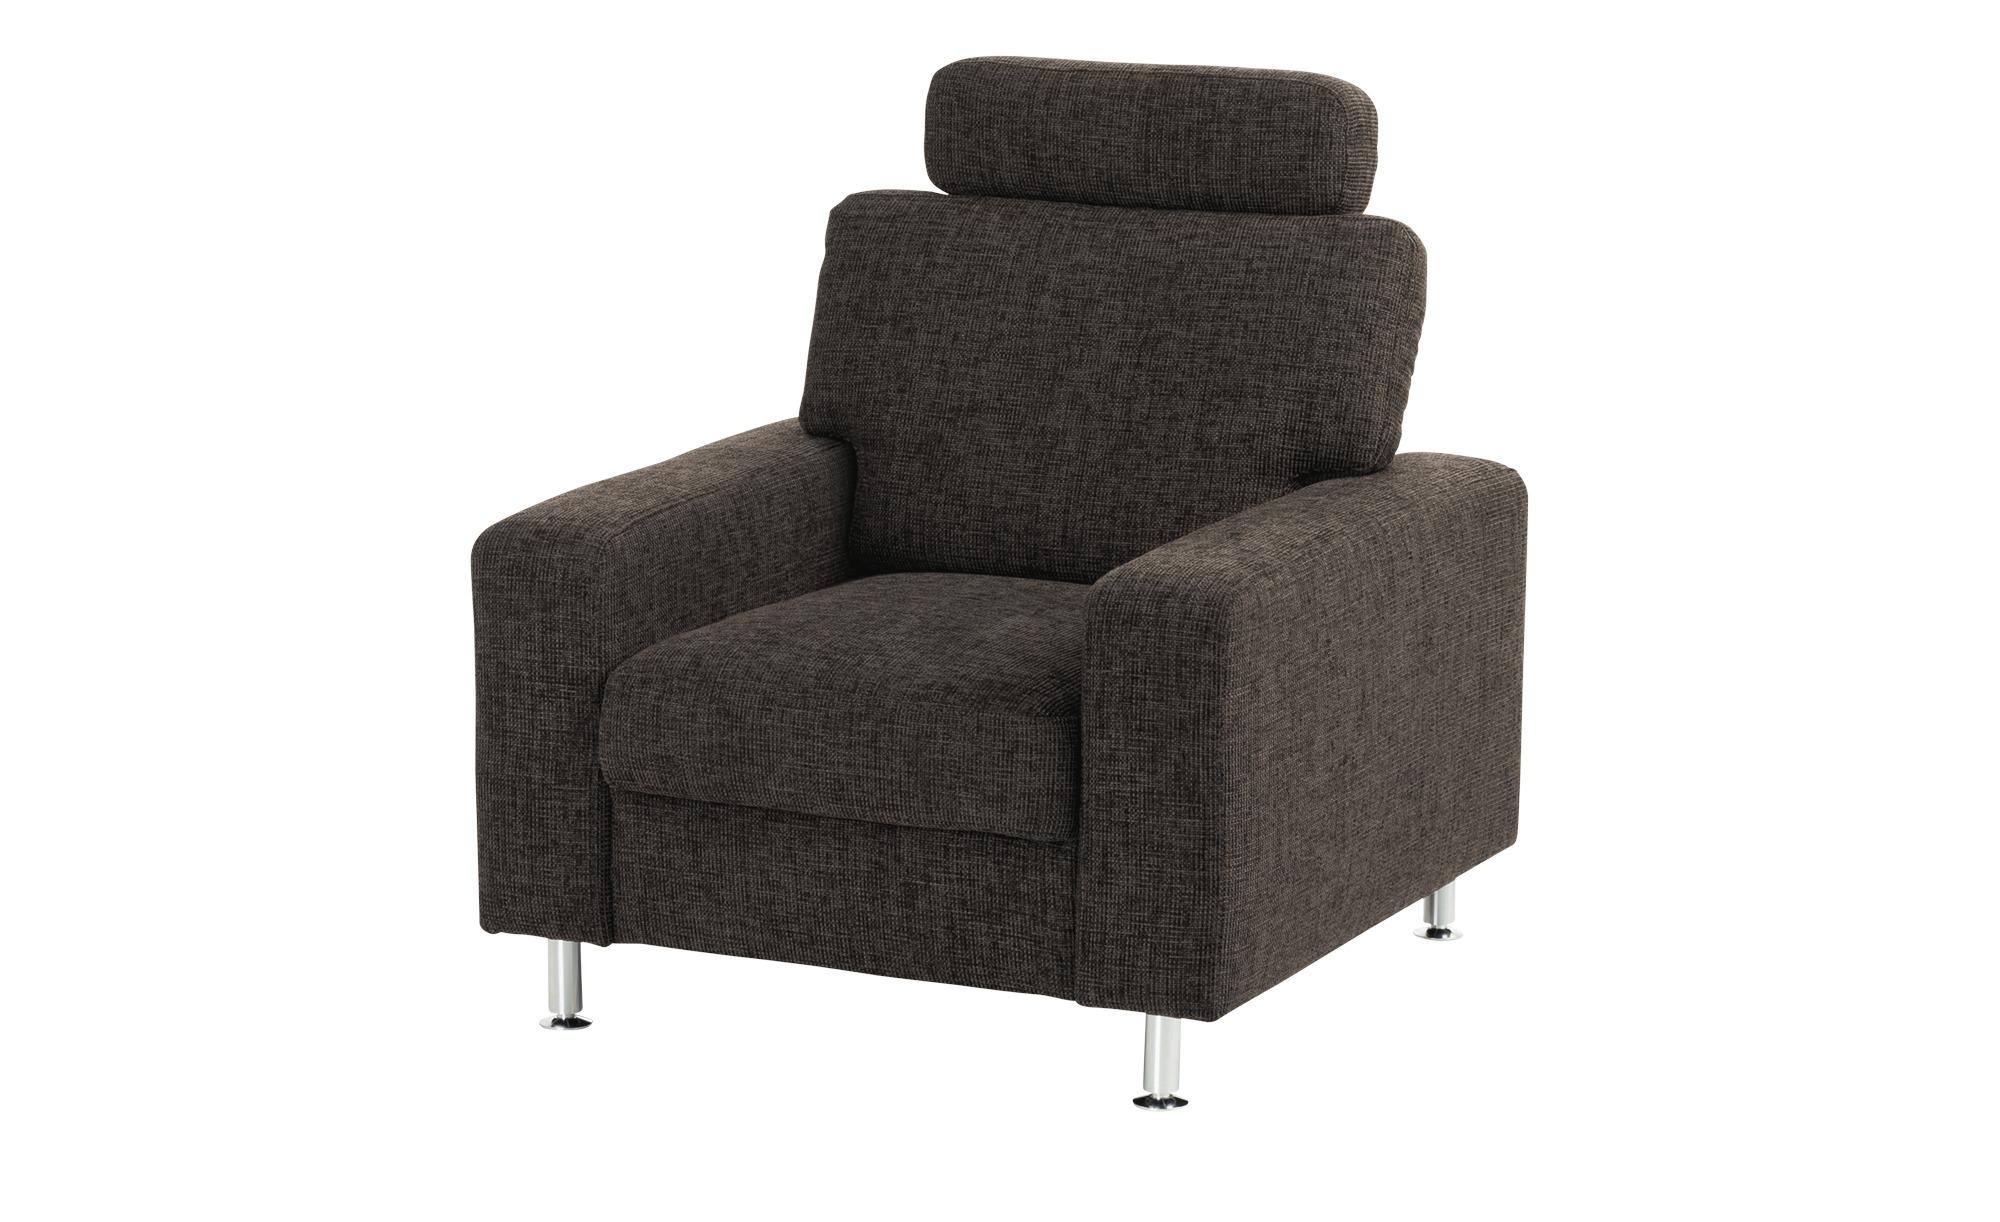 meinSofa Brauner Polstersessel  Jana ¦ braun ¦ Maße (cm): B: 88 H: 85 T: 95 Polstermöbel > Sessel > Polstersessel - Höffner